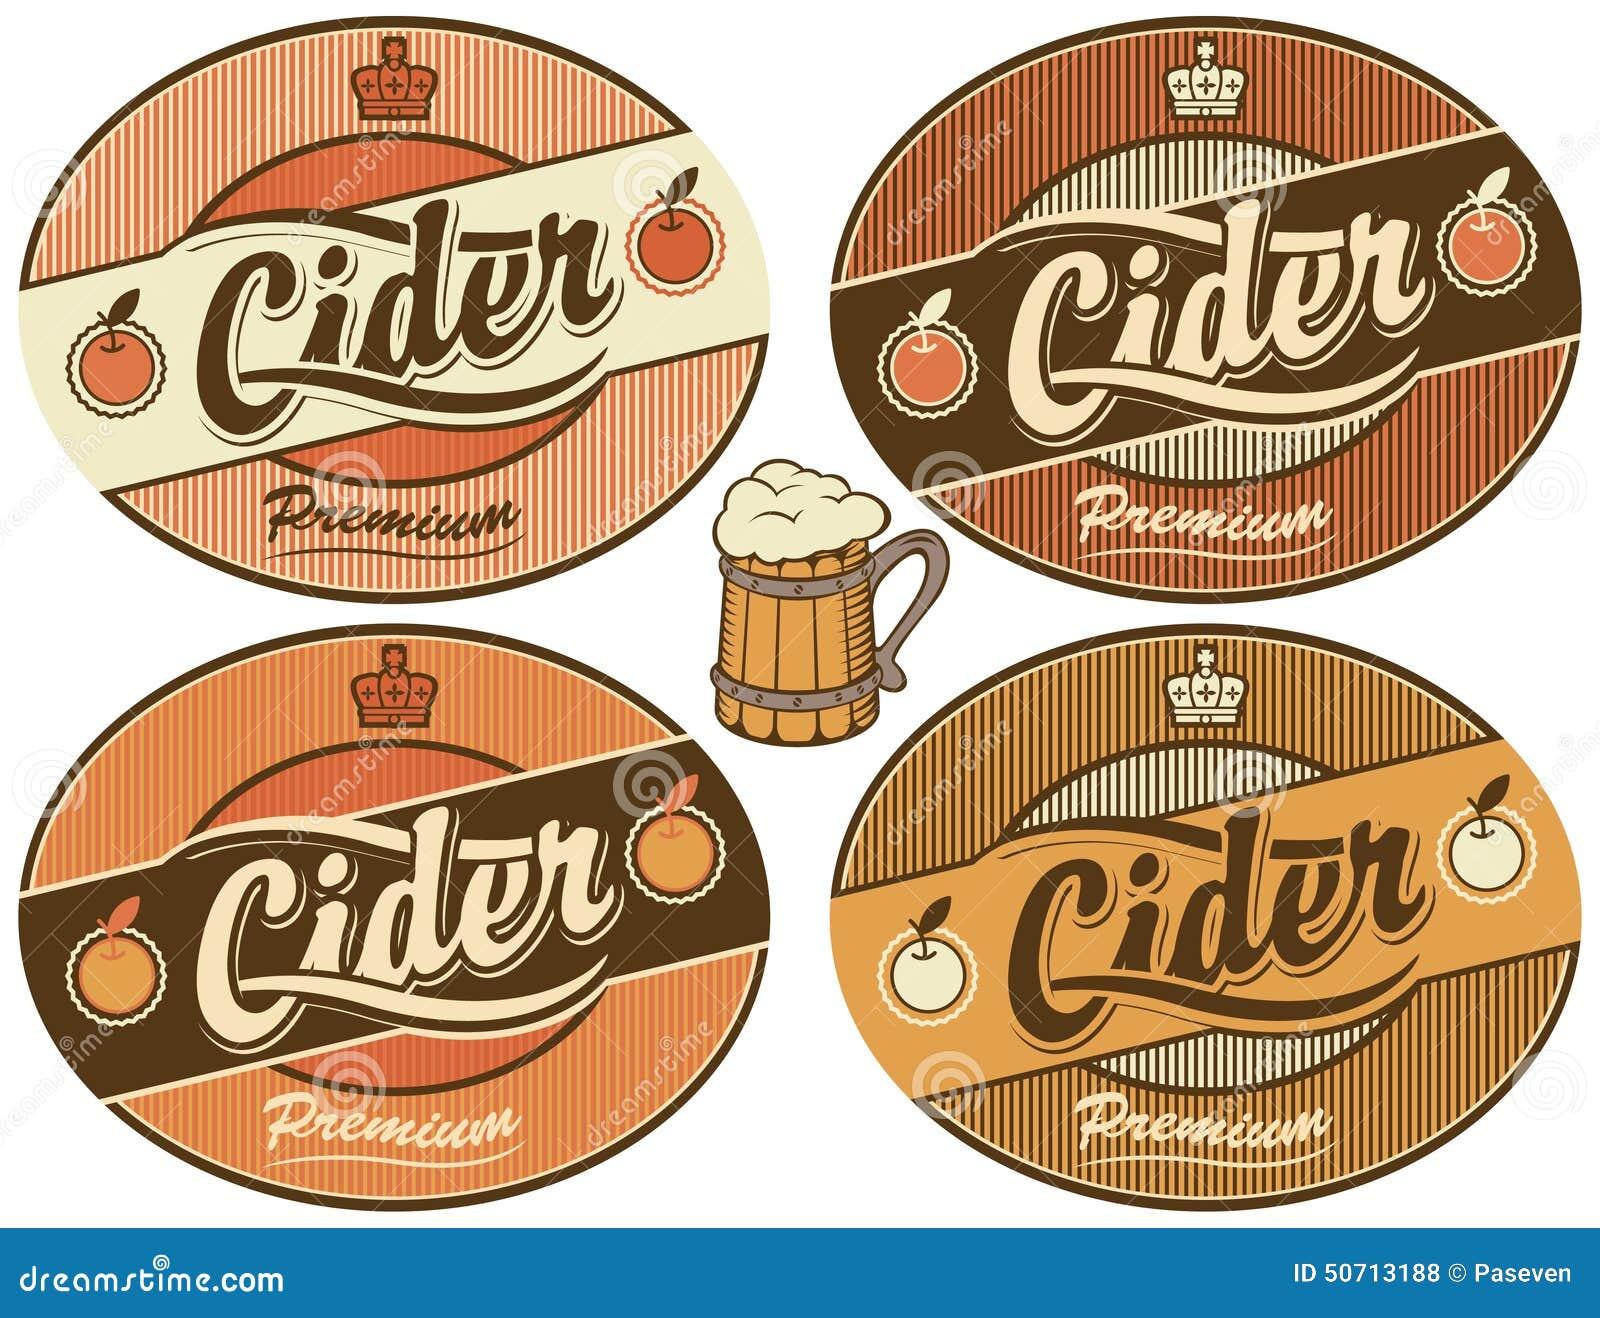 Cider Label Stock Vector Illustration Of Decoration 50713188